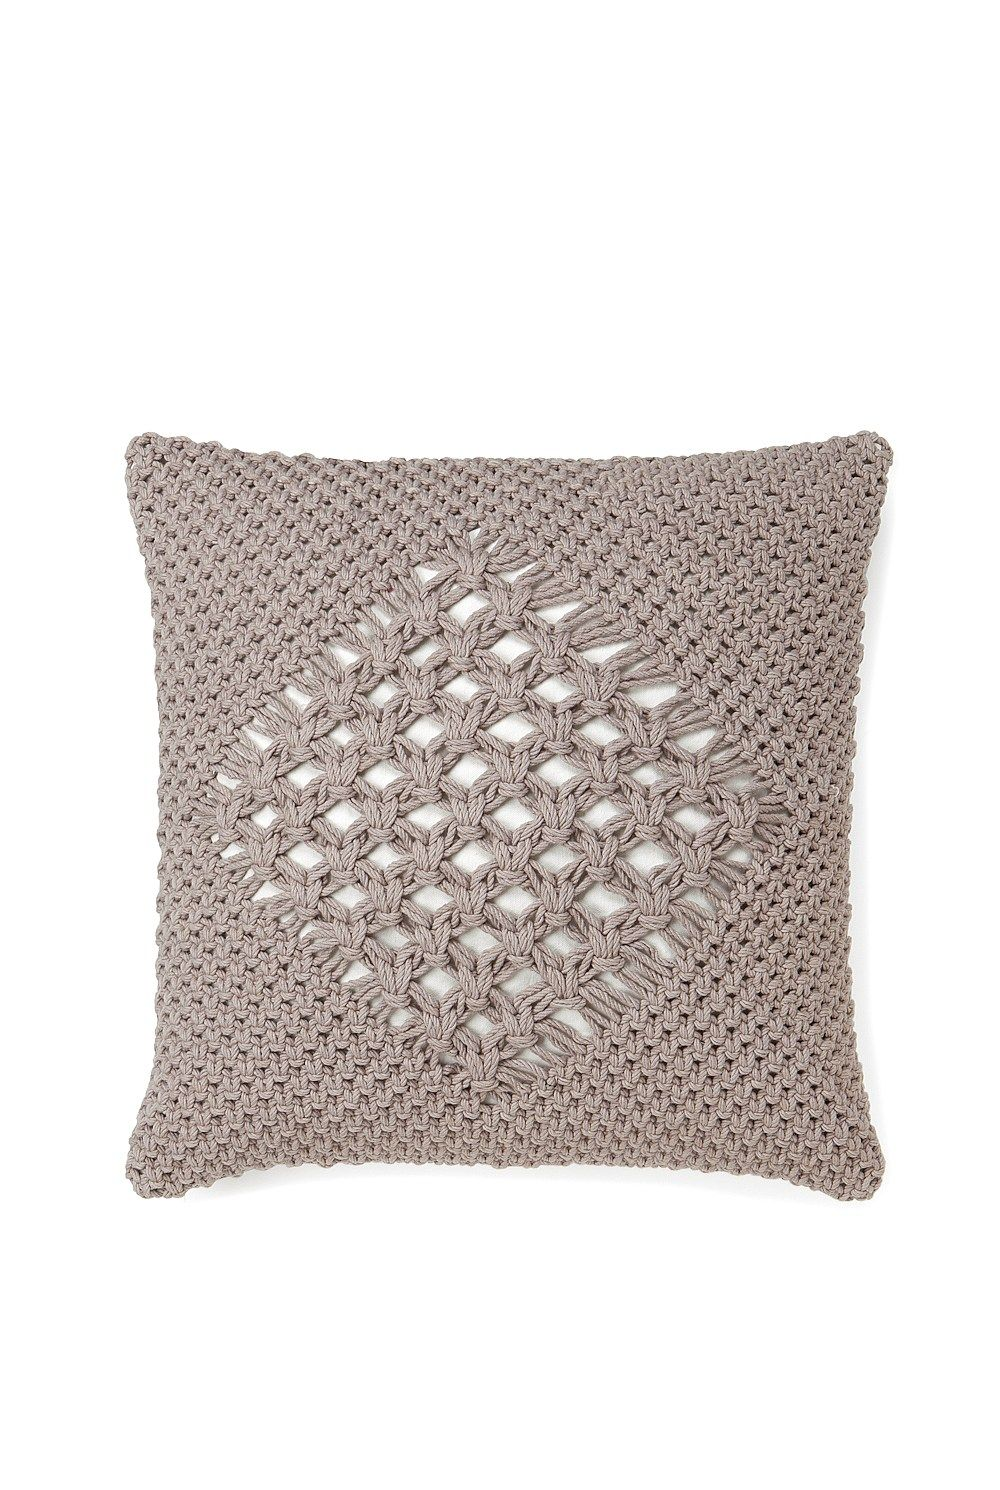 crochet pillow - My bestie crochets, this looks like a request ...